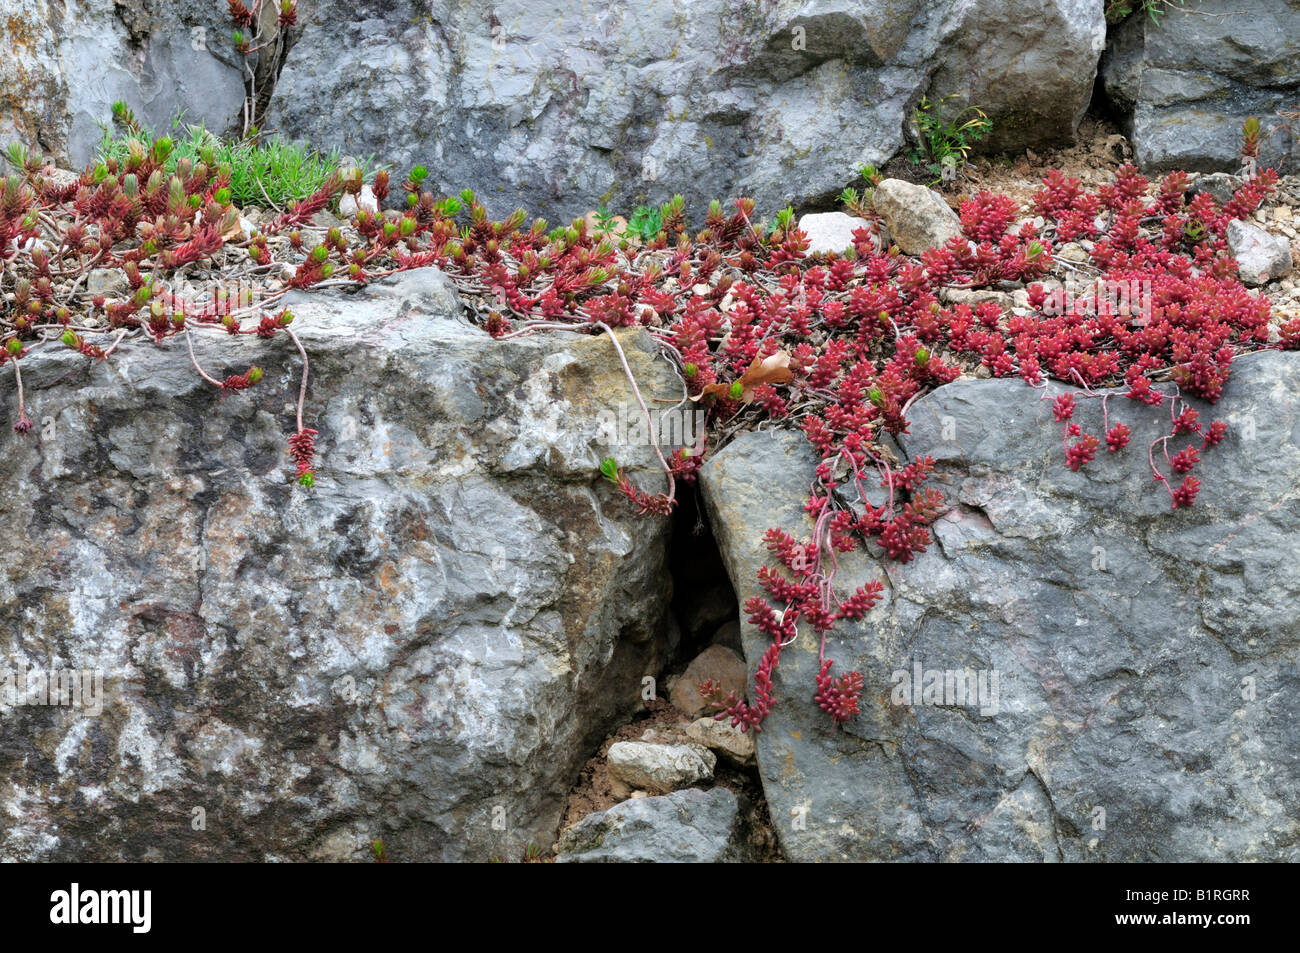 Rock Stonecrop (Sedum forsterianum) growing on rocks, red list of alpine plants, Germany, Europe - Stock Image